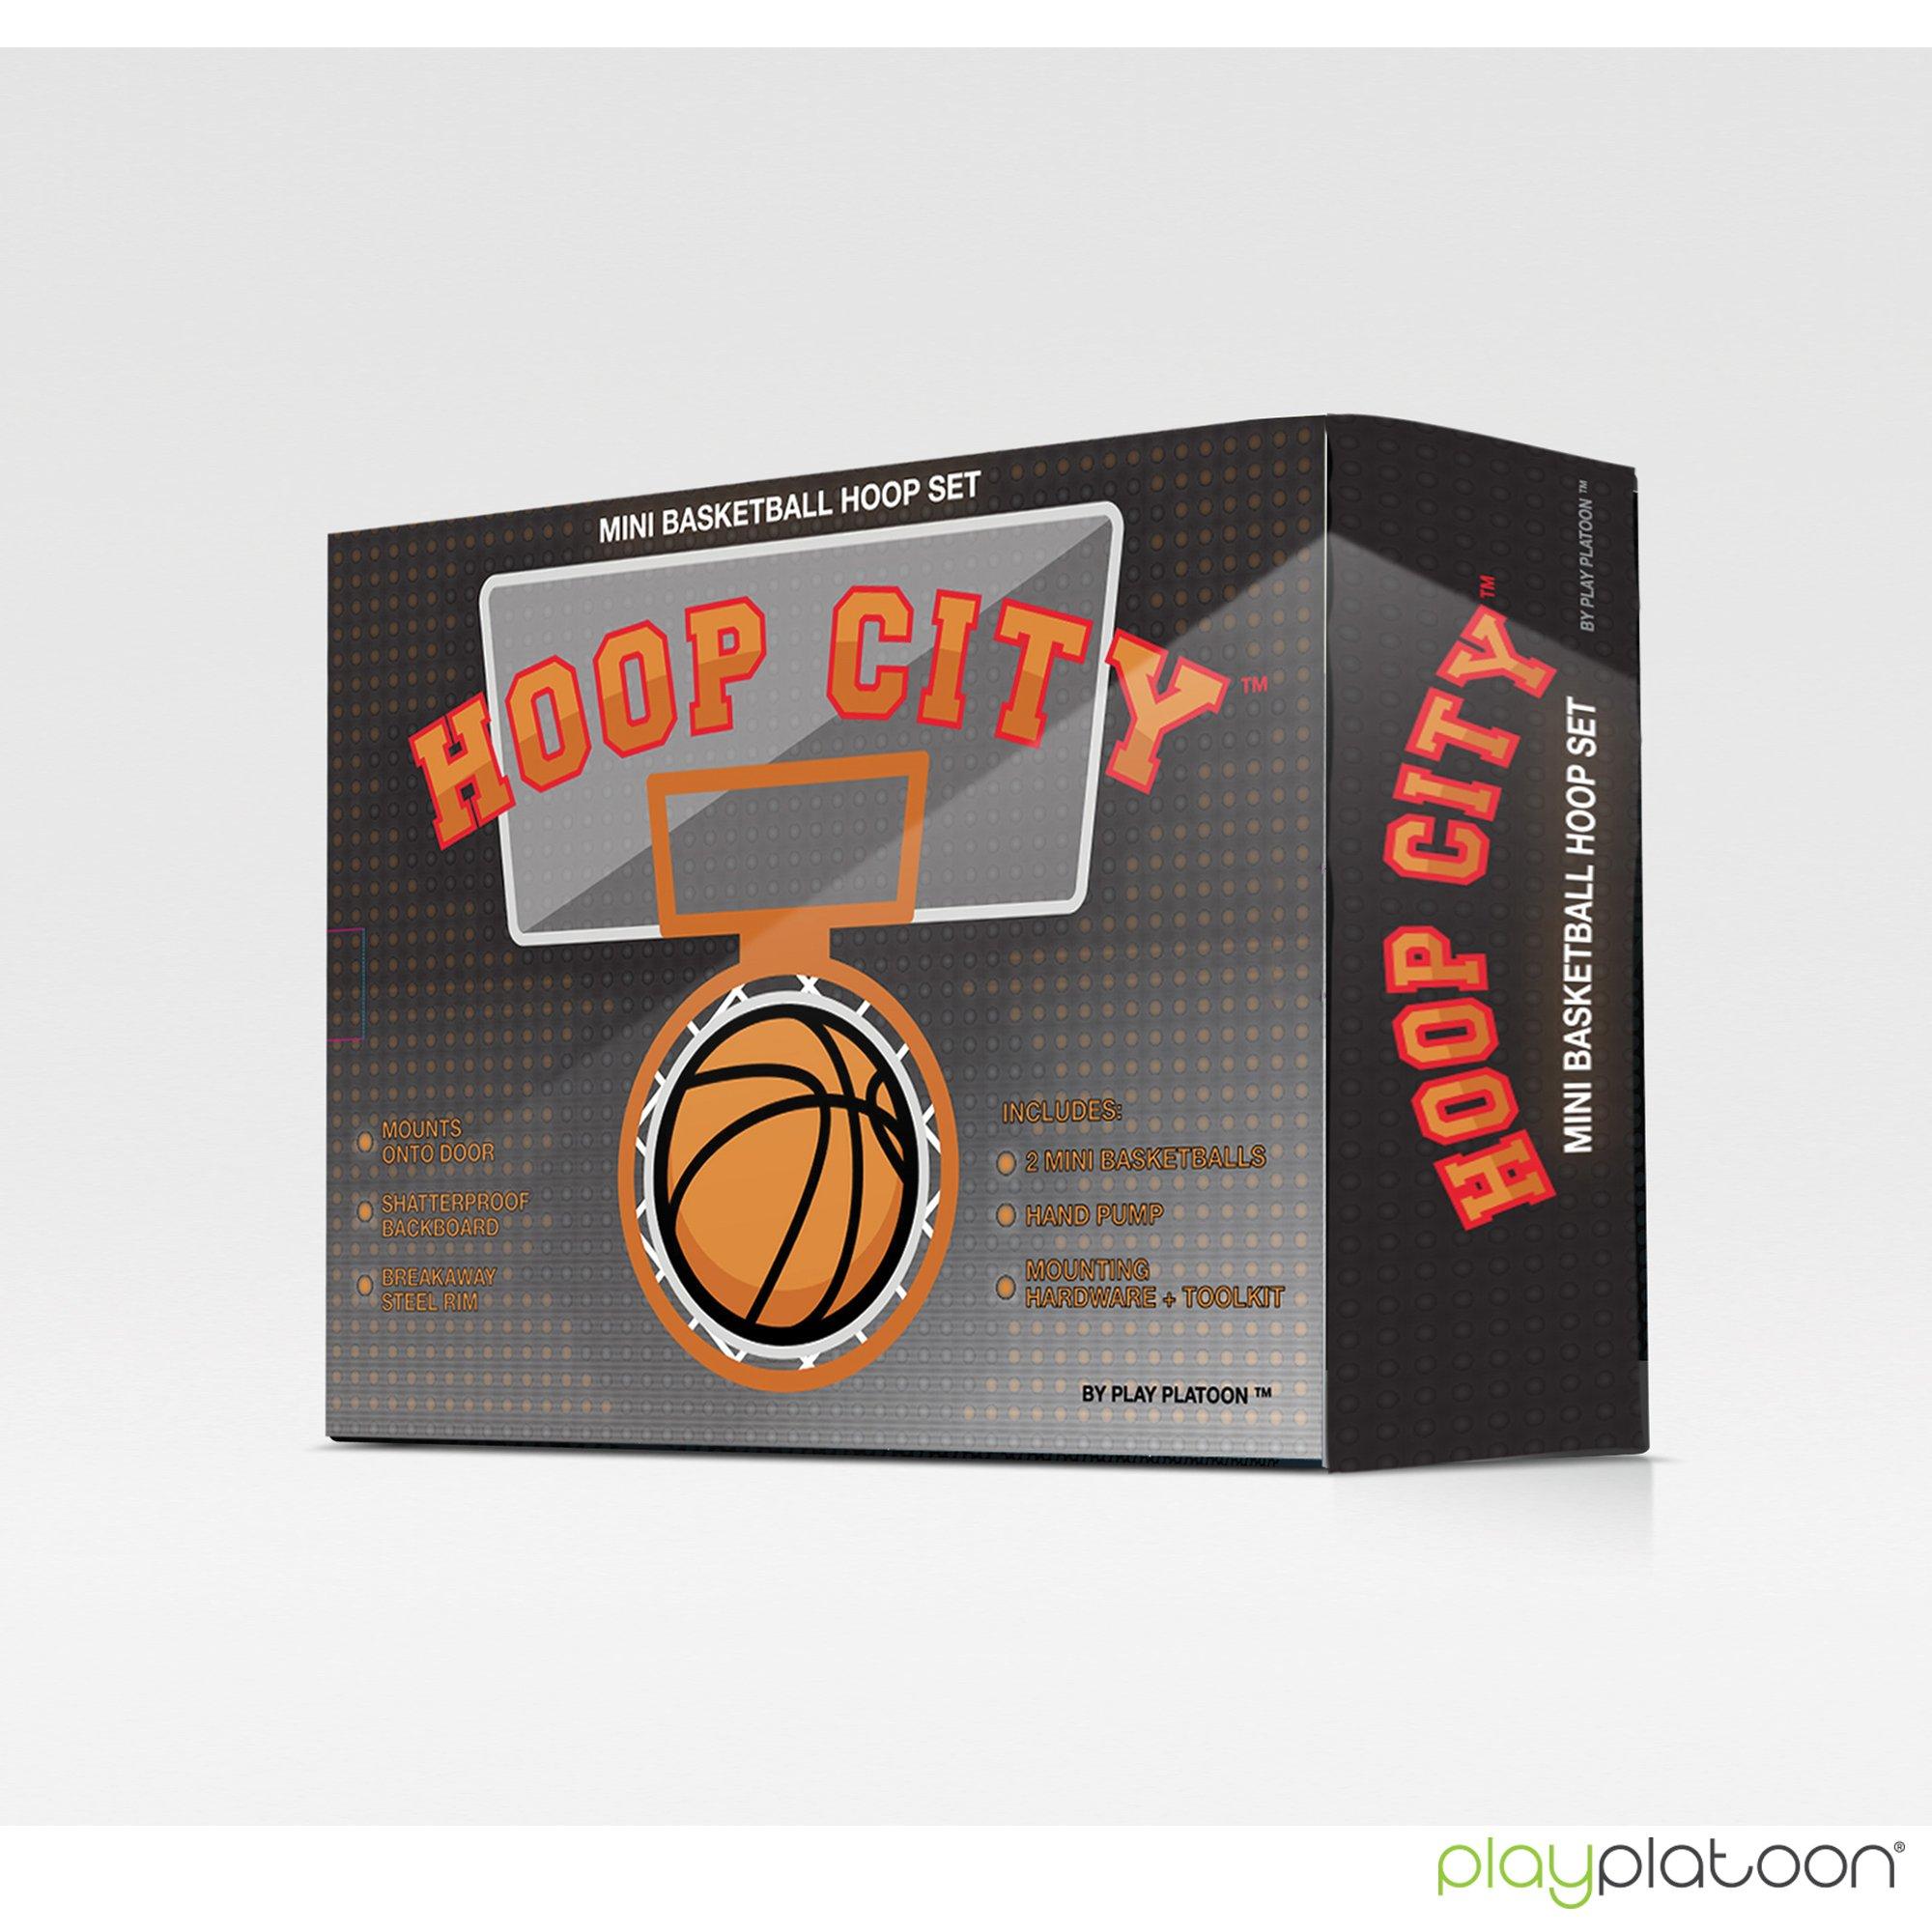 Play Platoon Mini Basketball Hoop for Door - 16 x 12 Inch Bedroom Basketball Hoop Indoors Set by Play Platoon (Image #5)